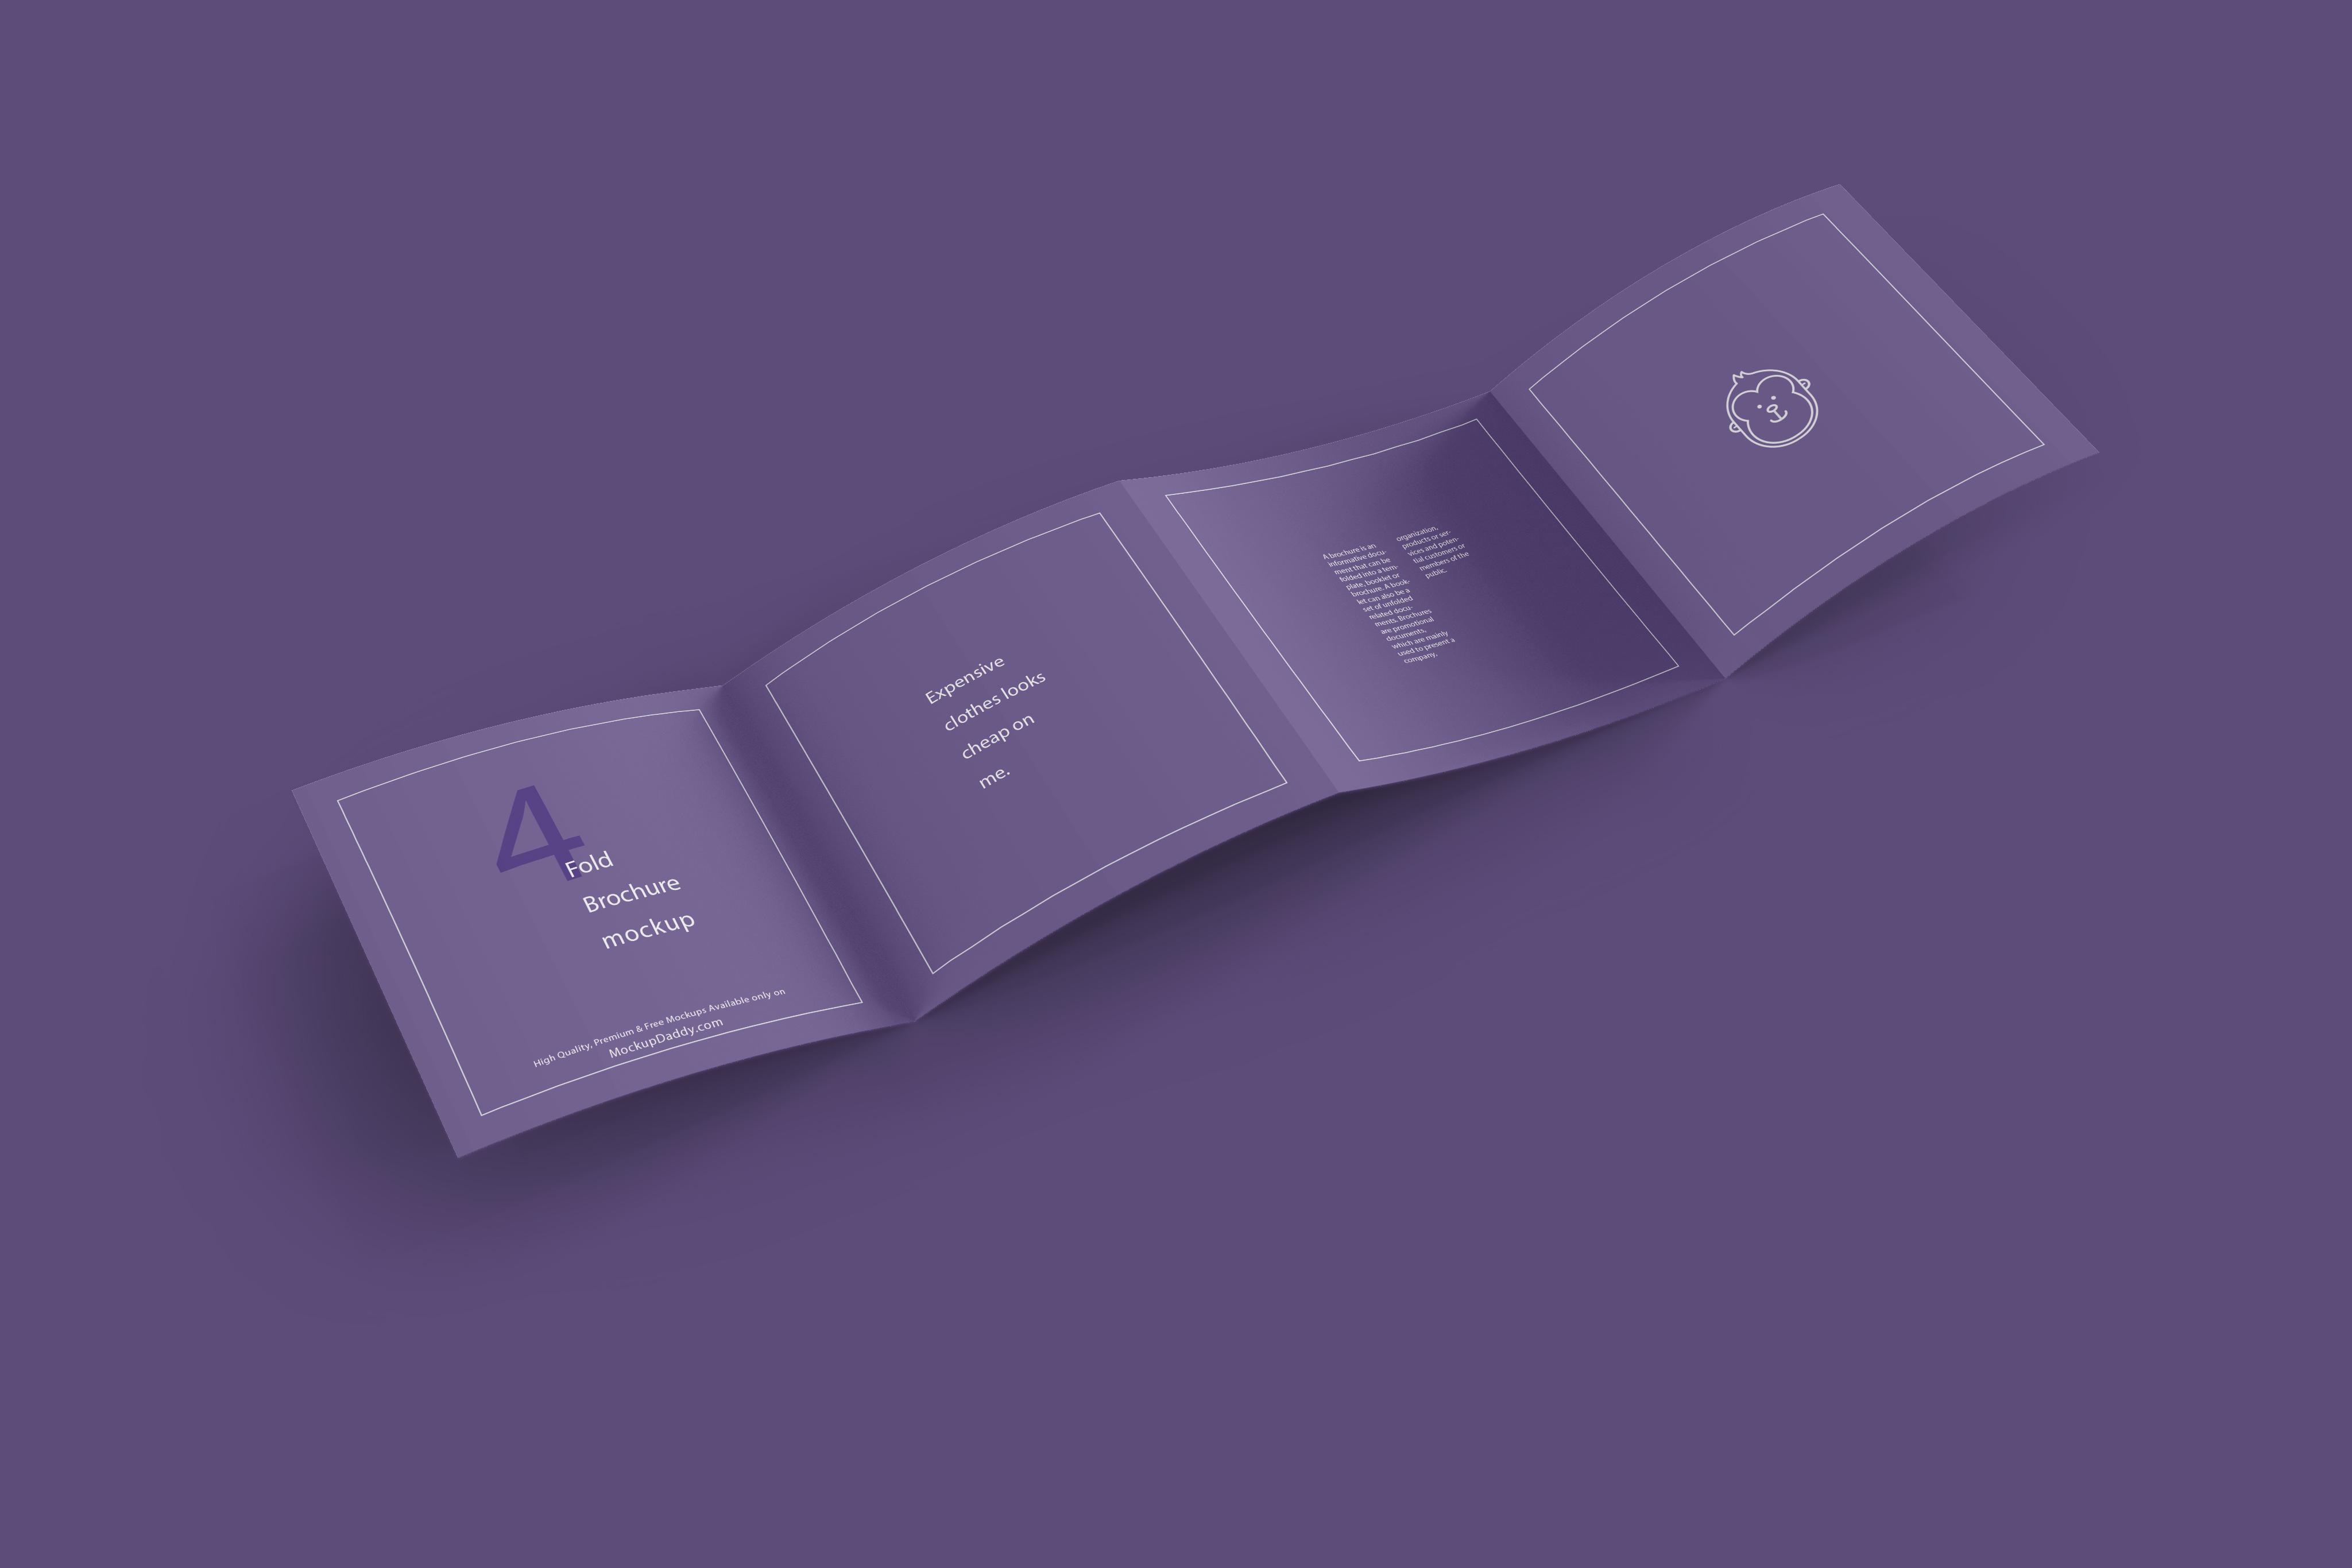 4 Fold Brochure Mockup - Mockup Daddy